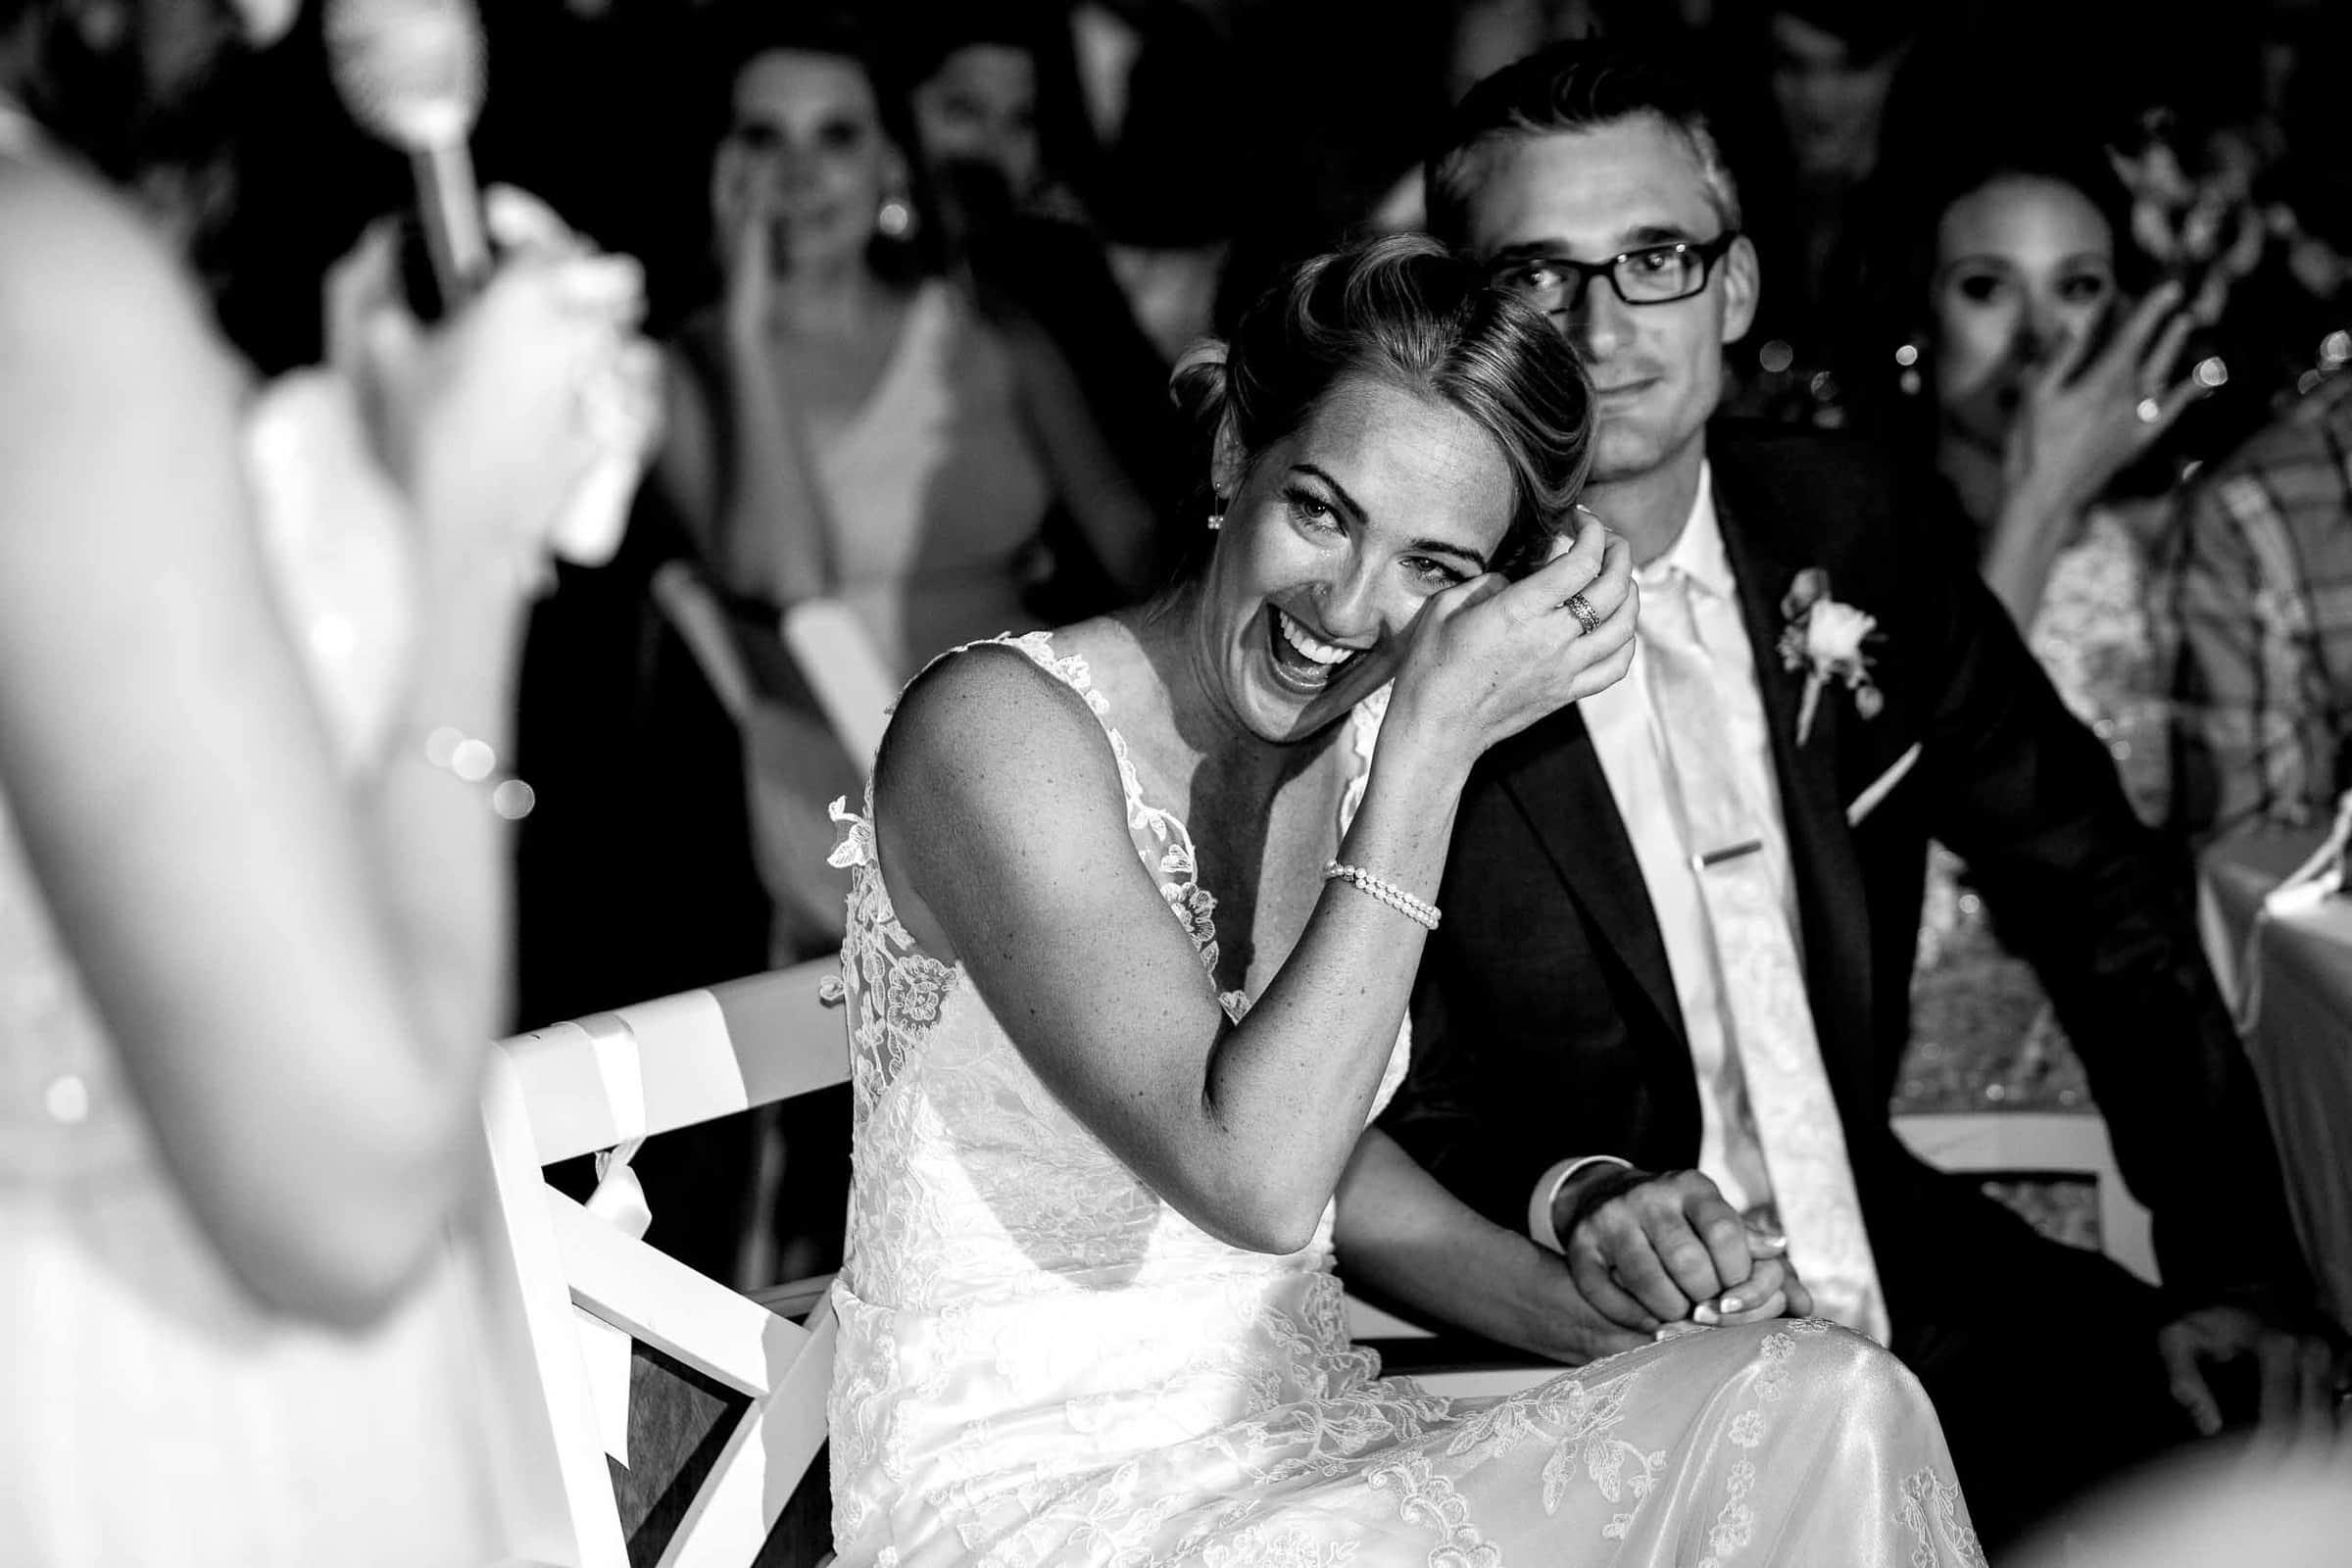 Emotional bride and groom listening to an epic speech during their Mt Hood Organic Farms wedding reception near Hood River Oregon